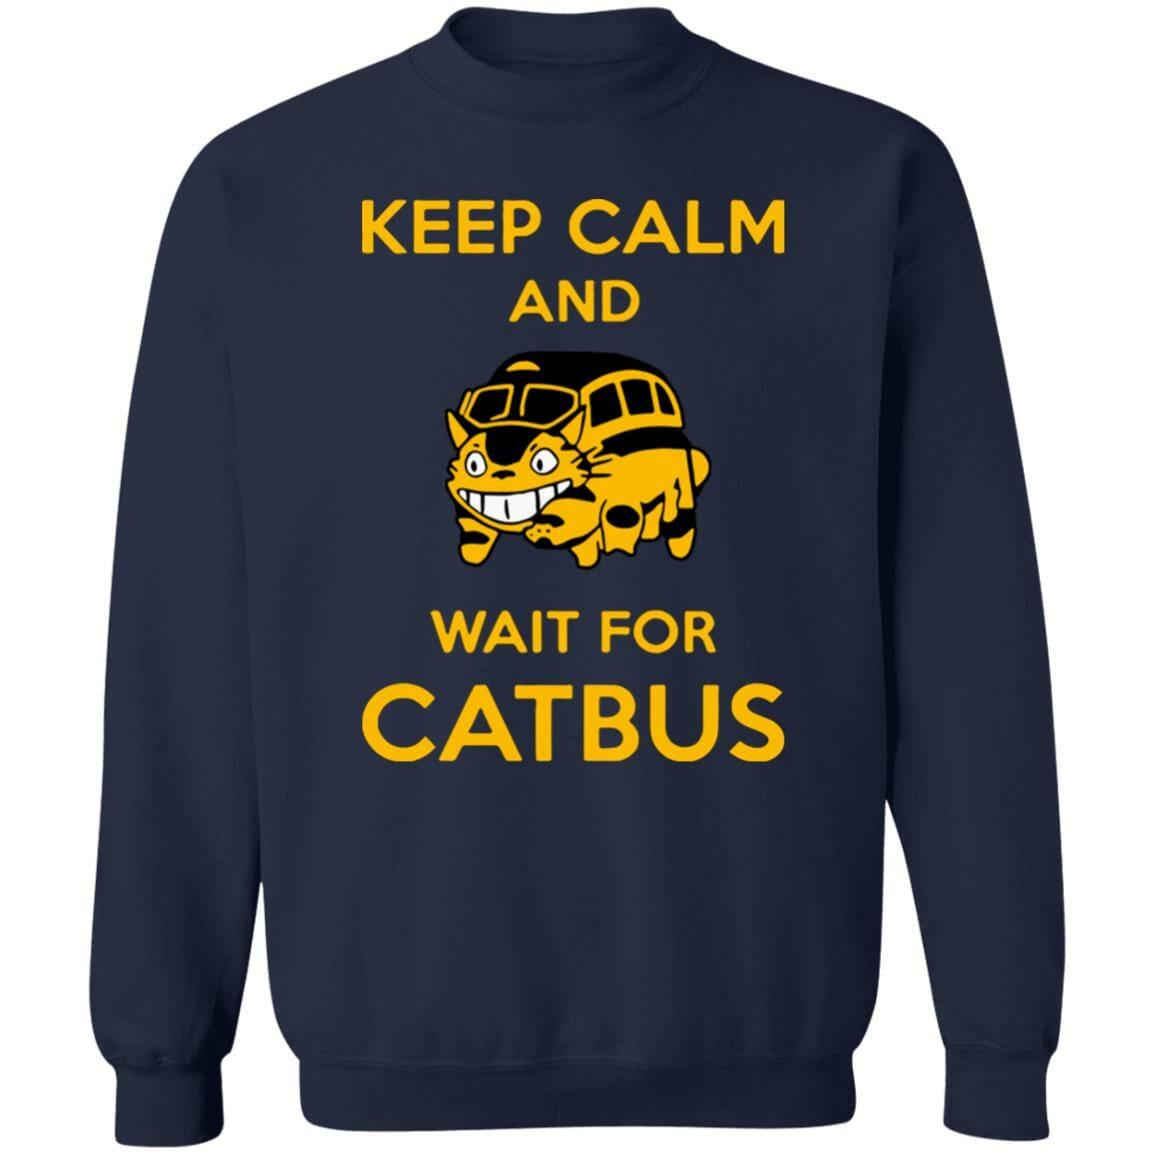 My Neighbor Totoro Keep Calm and Wait for Cat Bus Sweatshirt